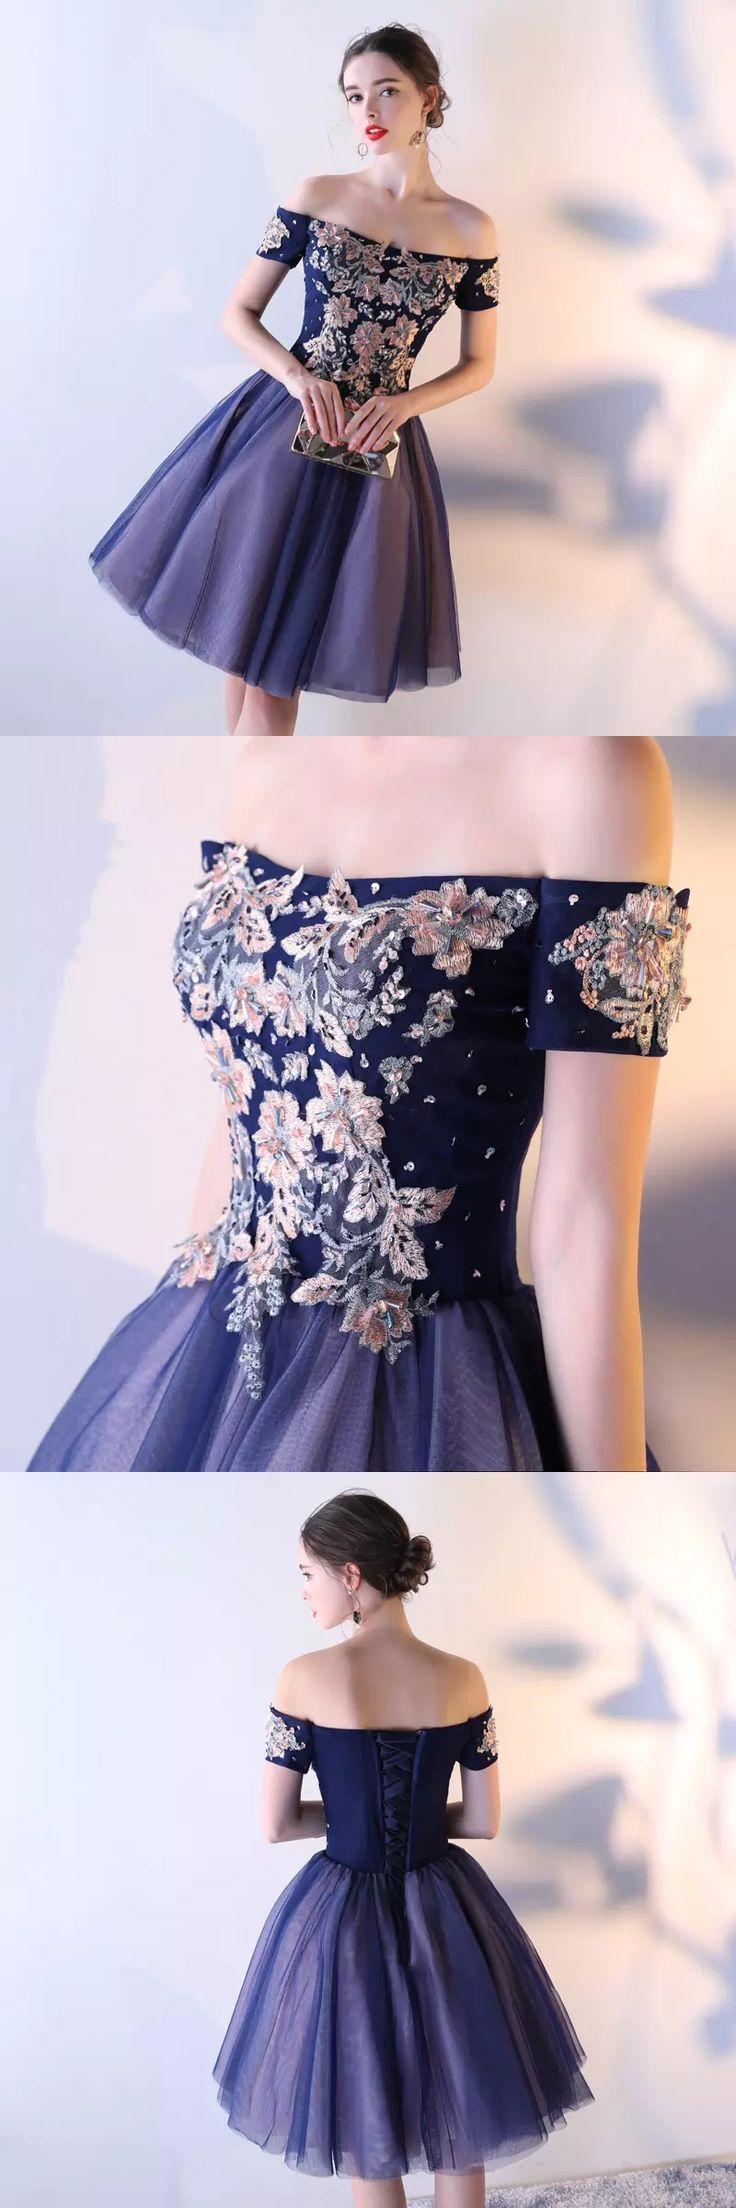 Tulle Homecoming Dress, Off Shoulder Homecoming Dress, Applique Junior School Dress#okbridal.co.uk#homecomingdresses comingdress